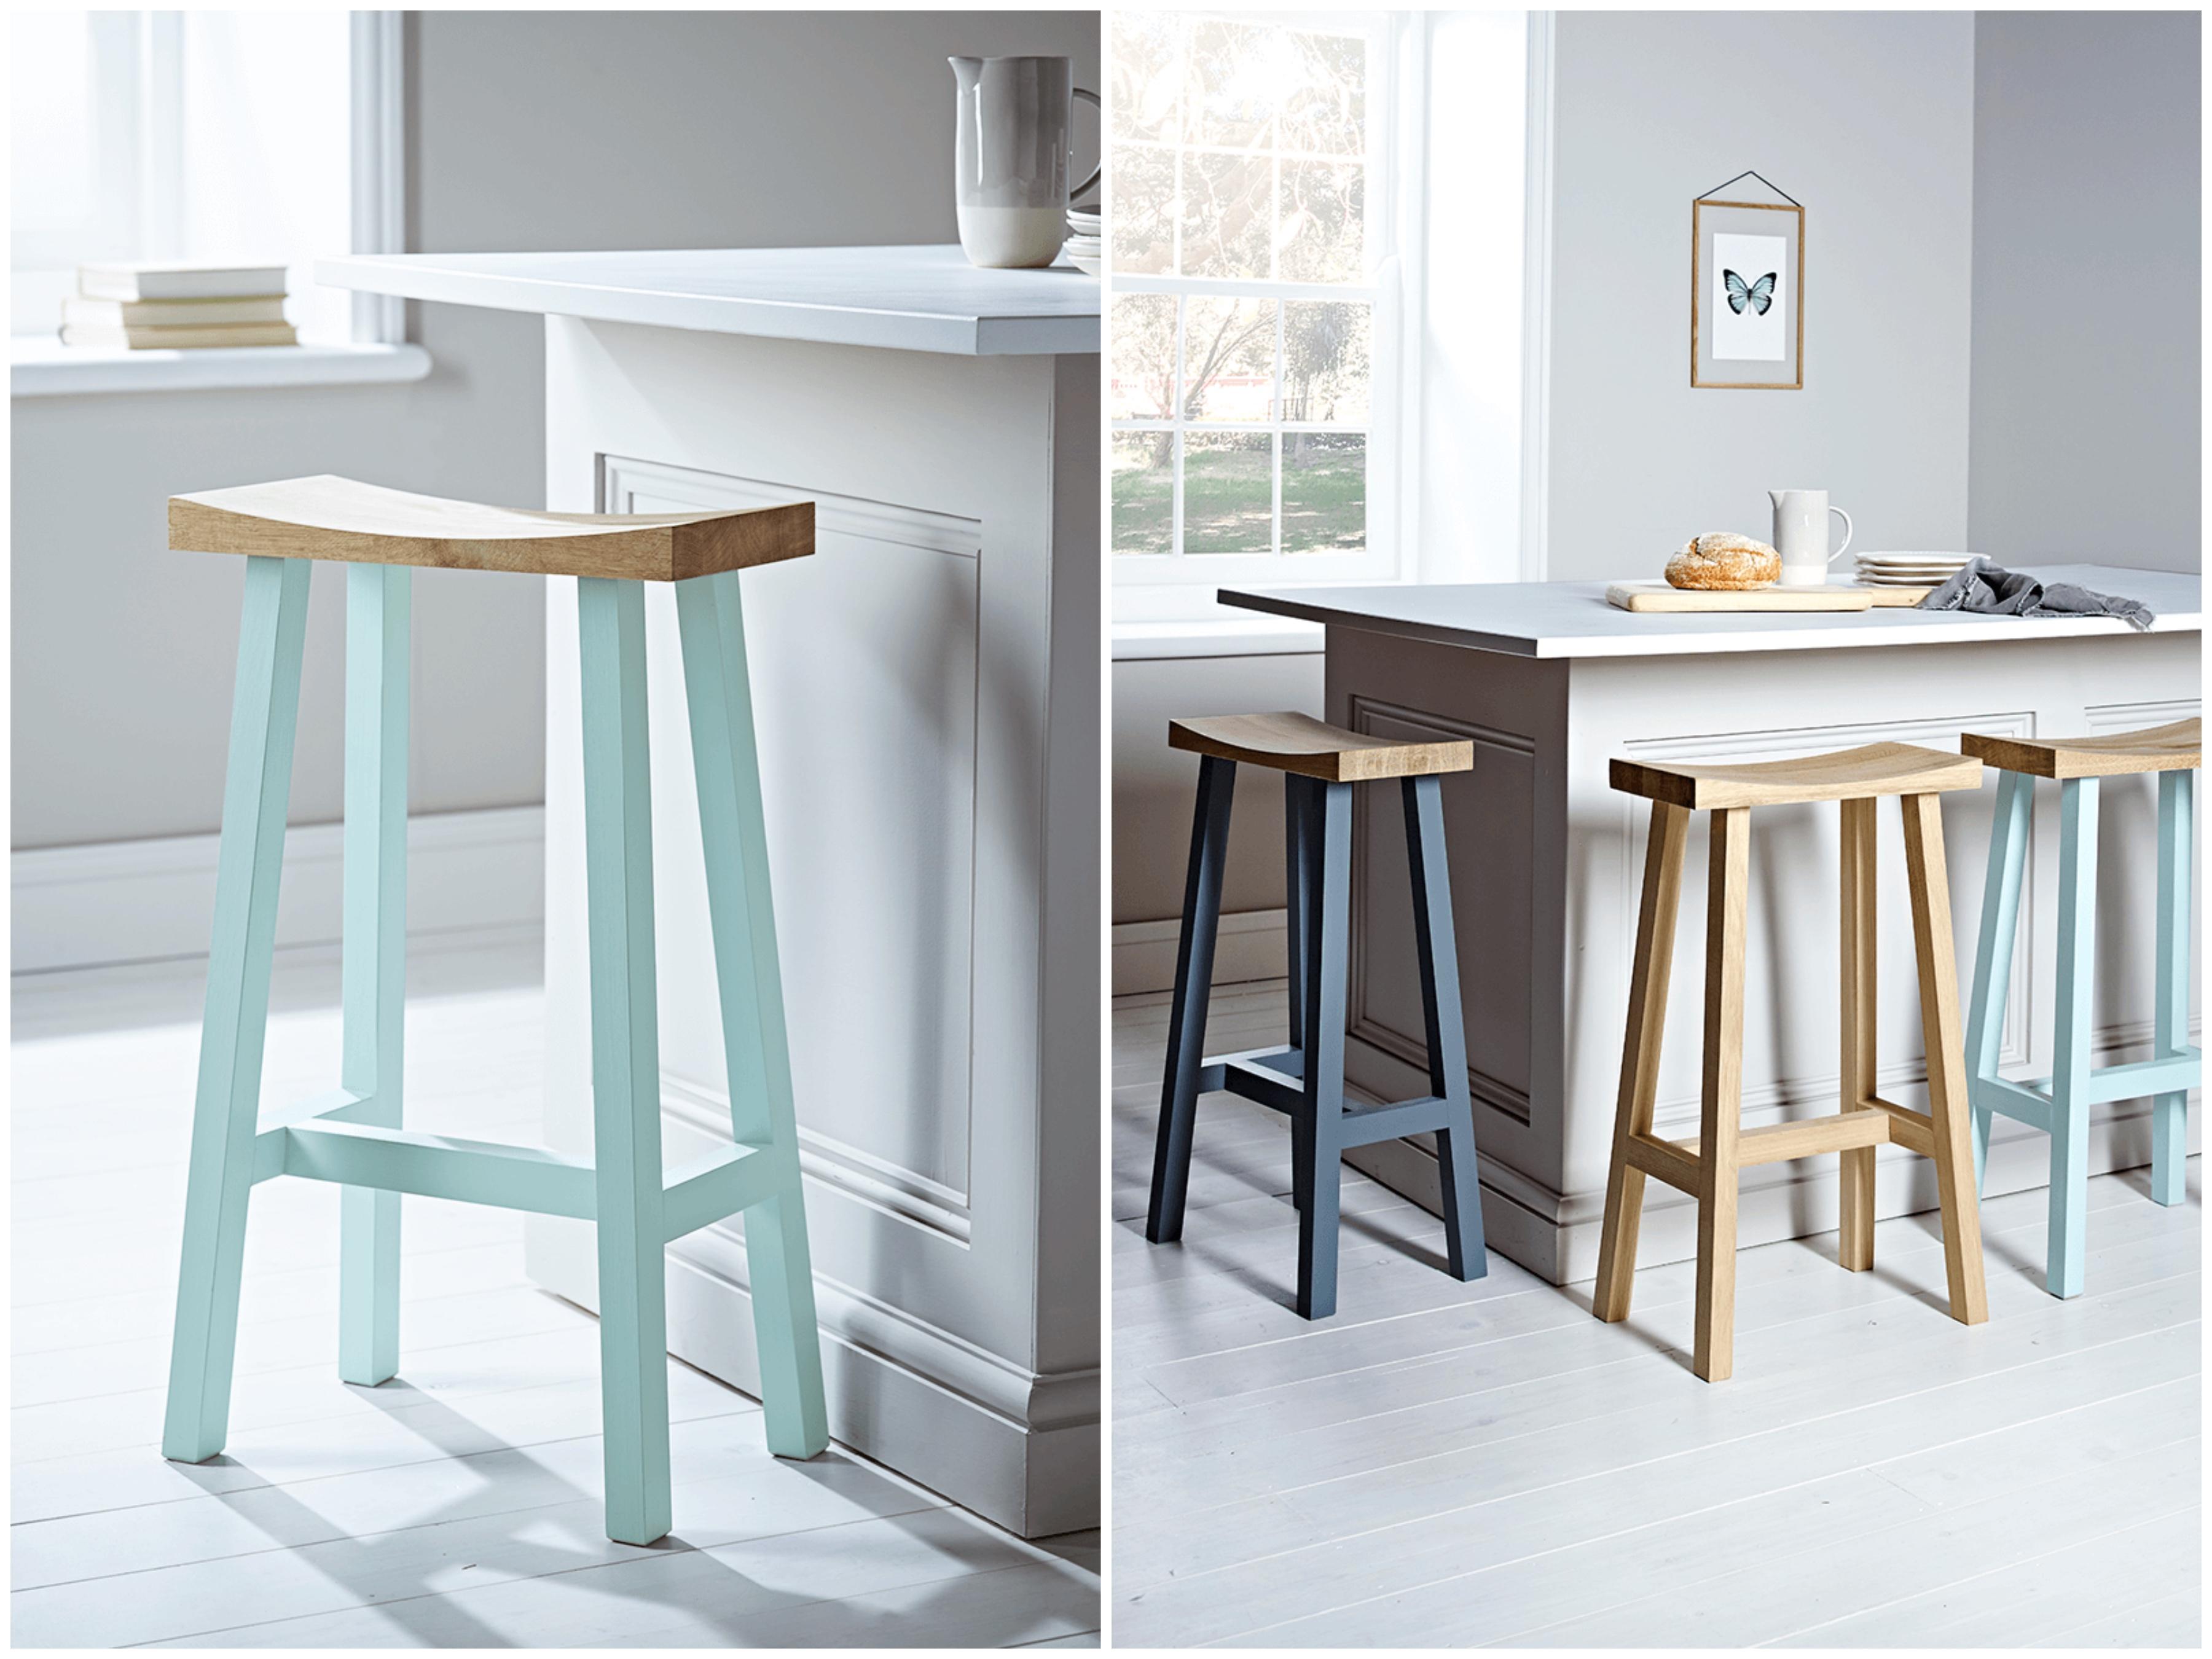 Fabulous Bar Stools For Kitchen Islands Bespoke Top 5 Stylish Bar Theyellowbook Wood Chair Design Ideas Theyellowbookinfo